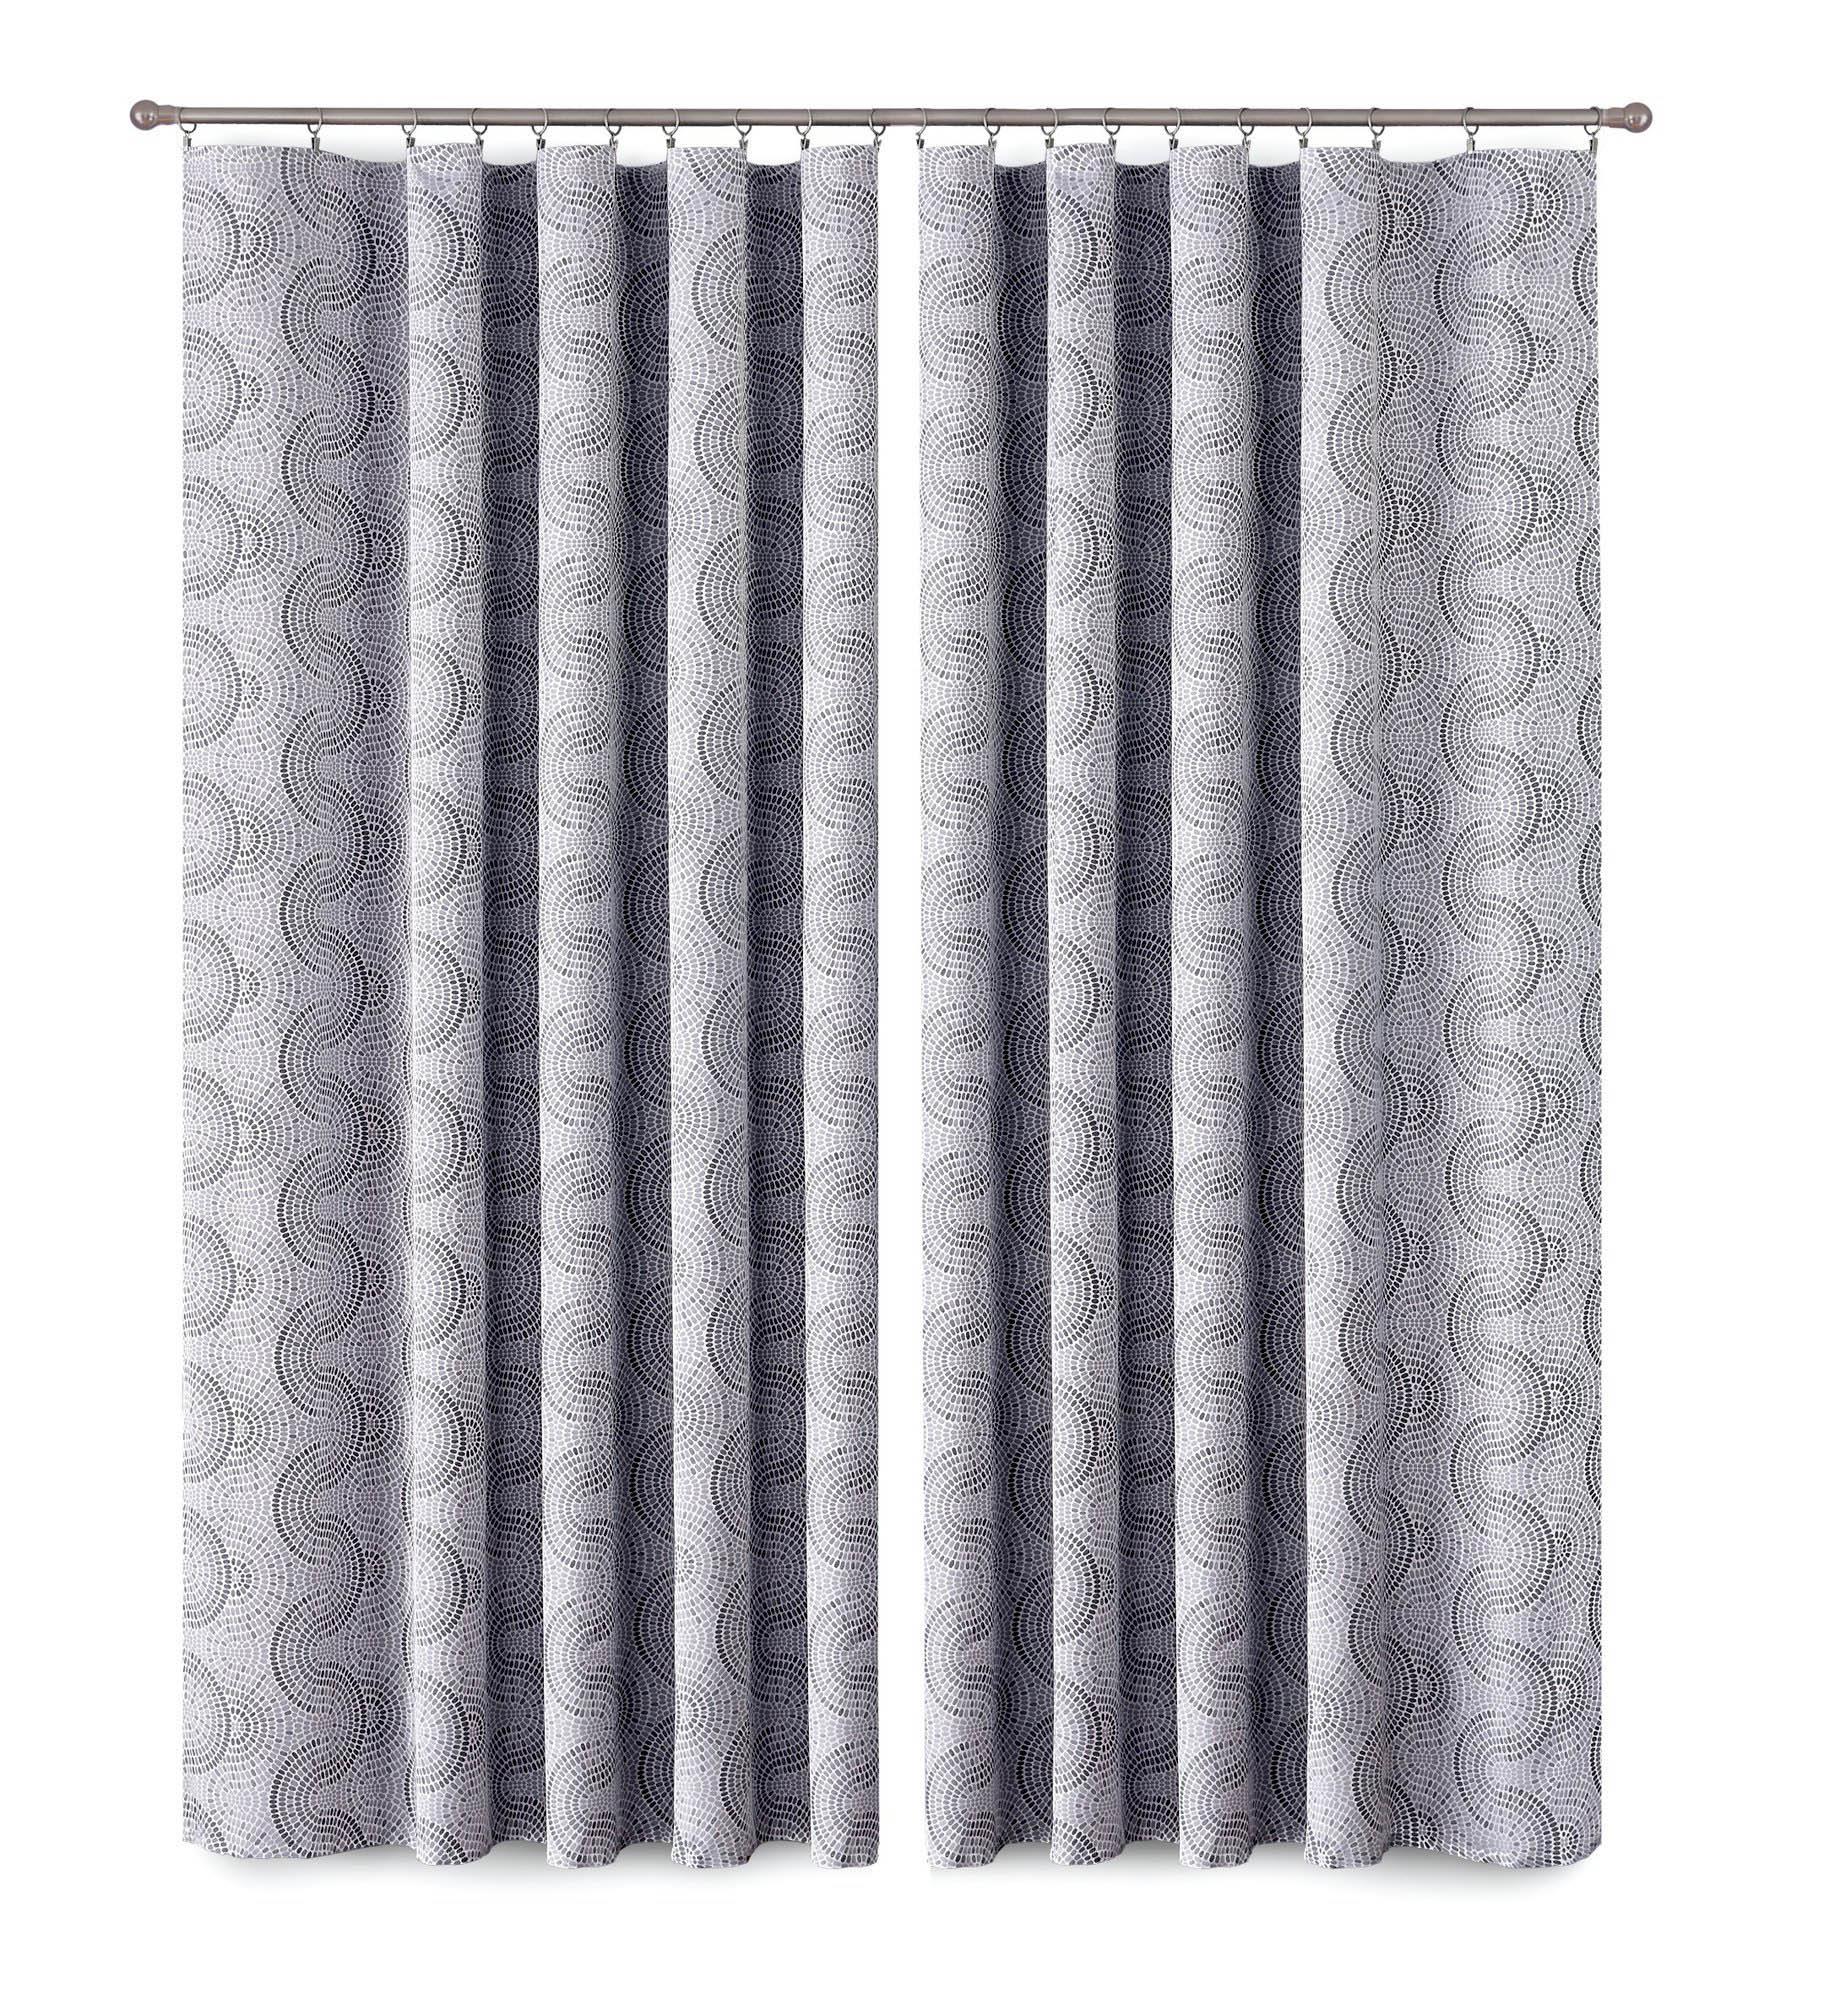 Шторы Primavera Классические шторы Delicia Цвет: Серый шторы primavera классические шторы tilly цвет серый